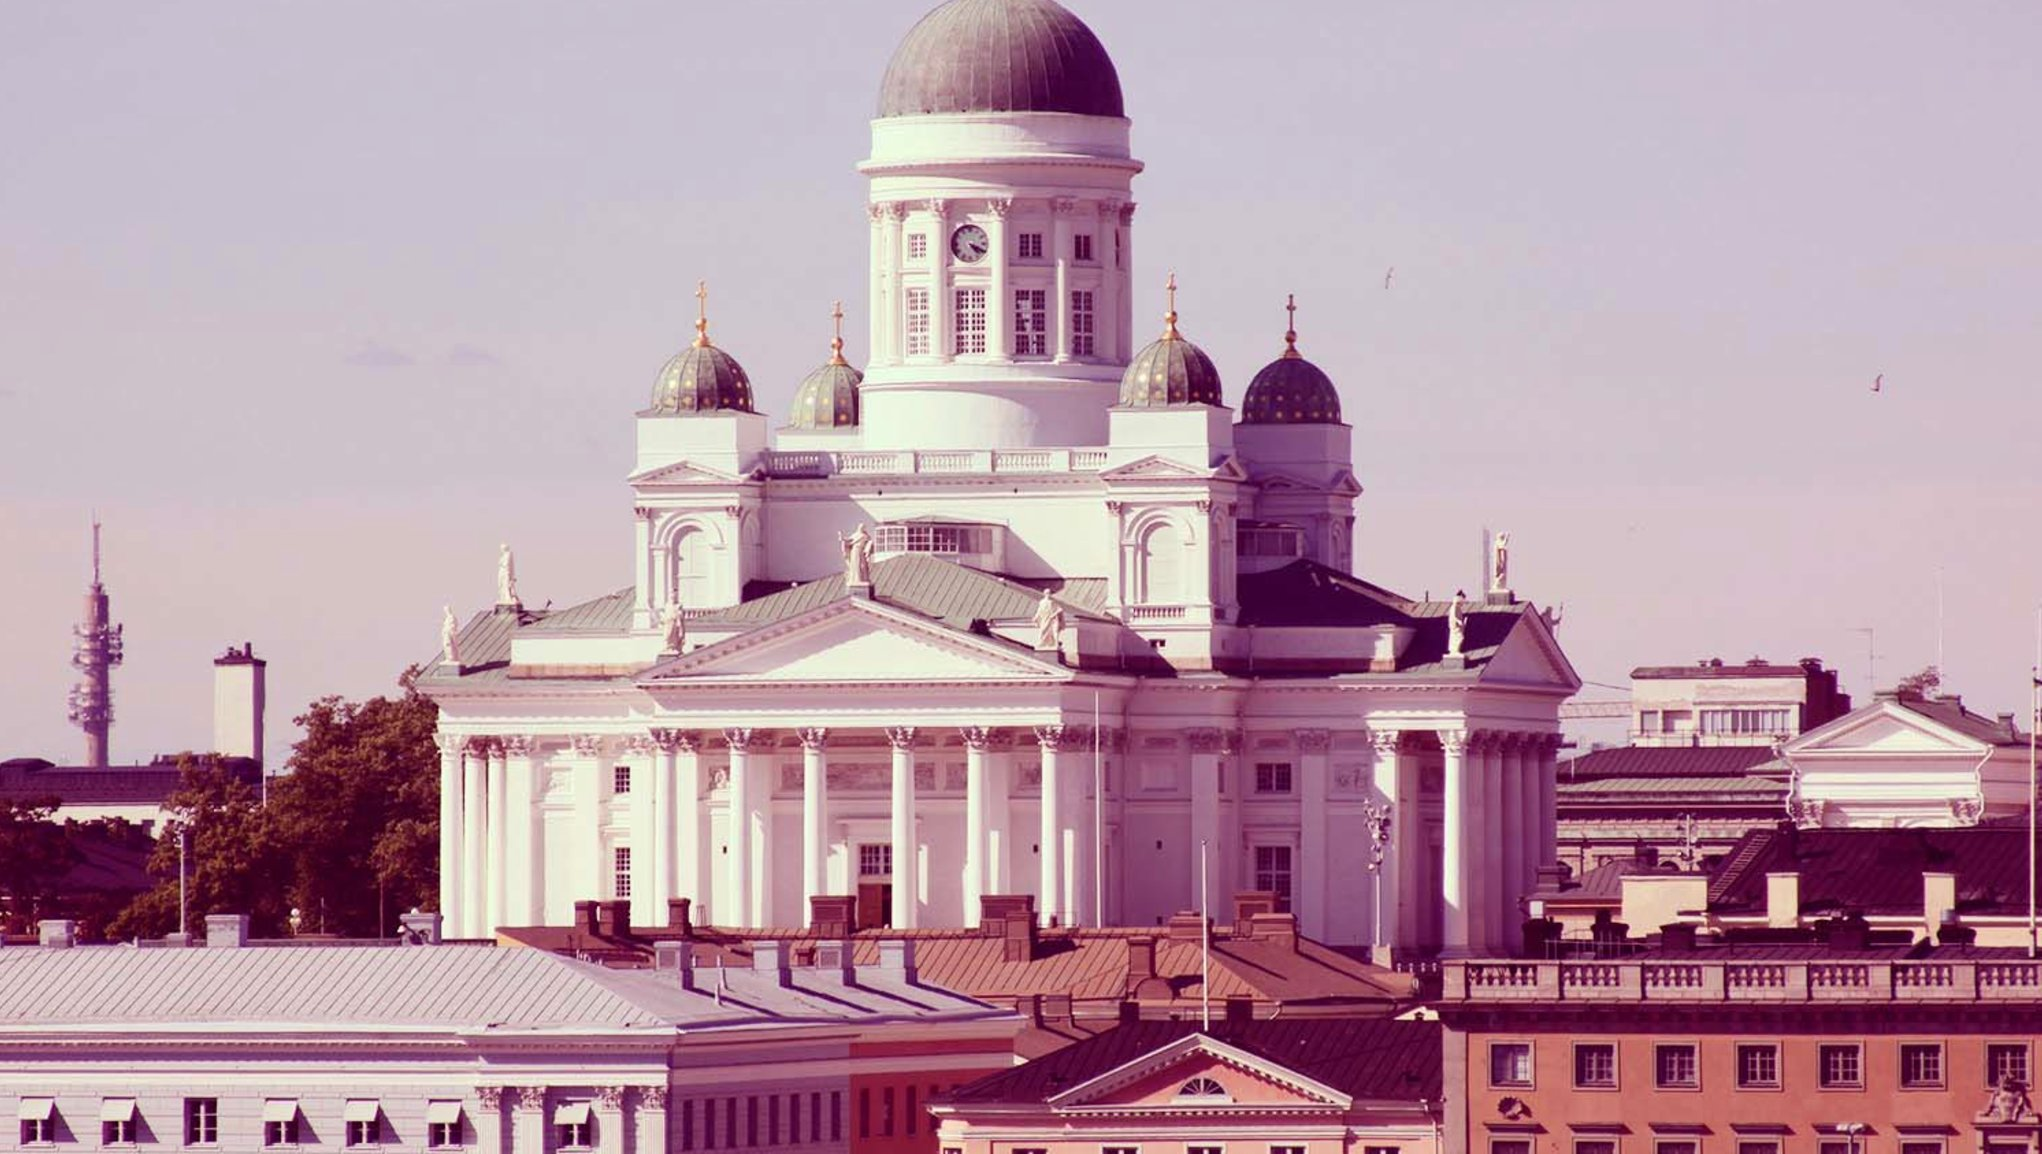 Helsinki Finland photo